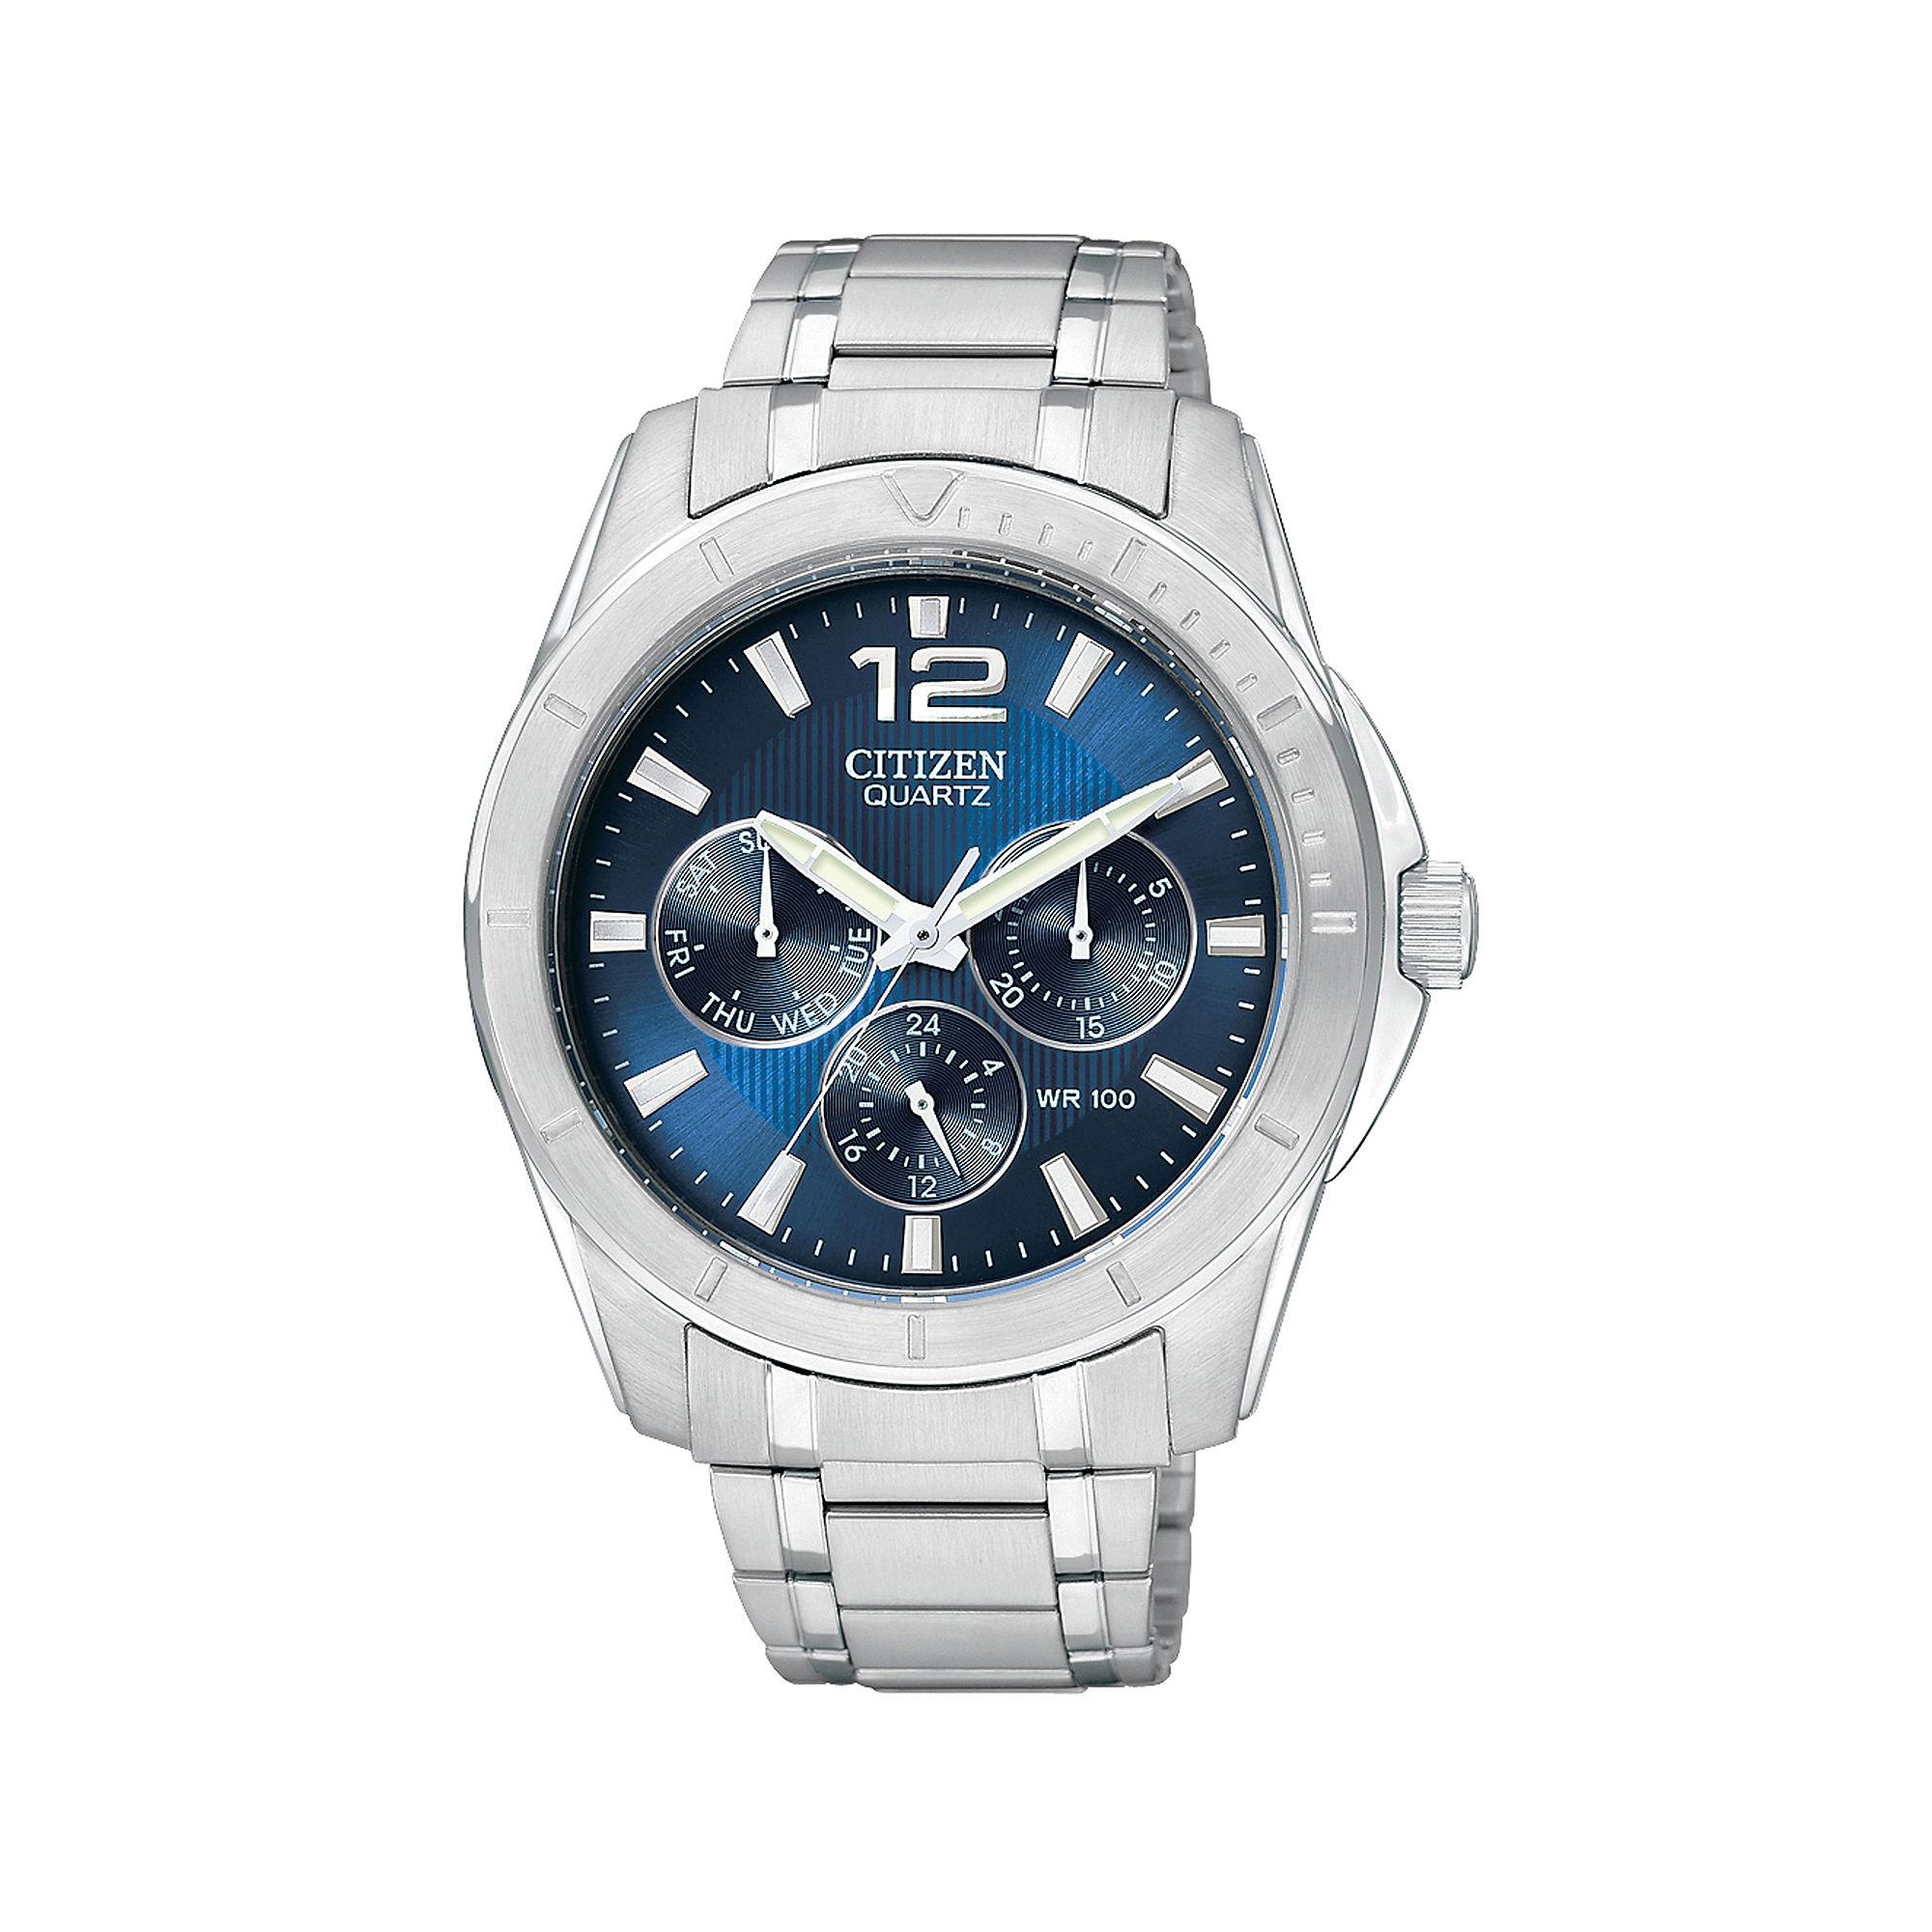 Citizen Mens Blue Dial Silver-Tone Watch AG8300-52L